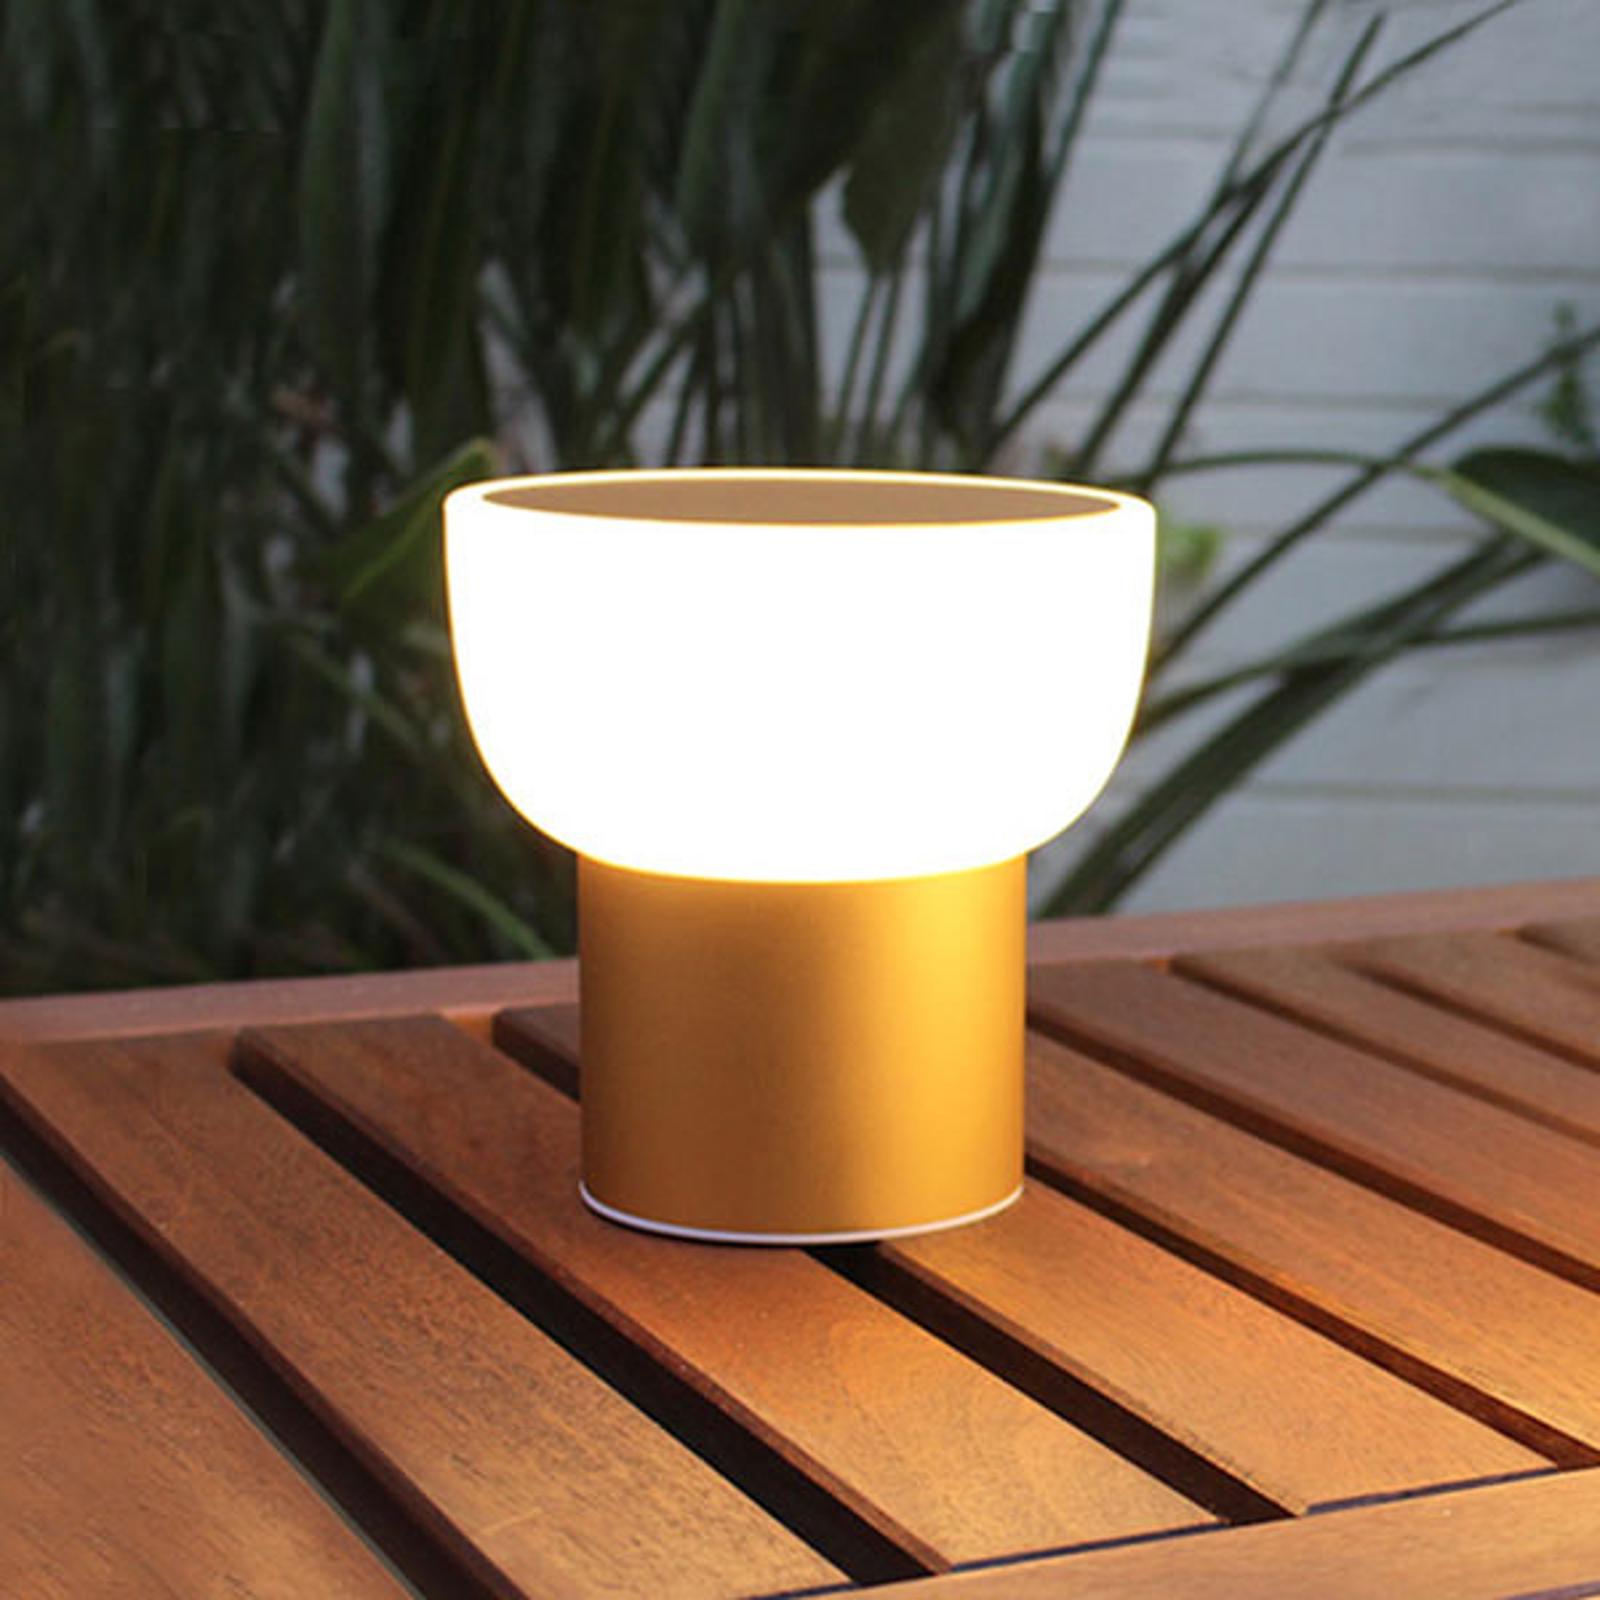 LED utomhusdekorationslampa Patio guld 16cm x1 USB